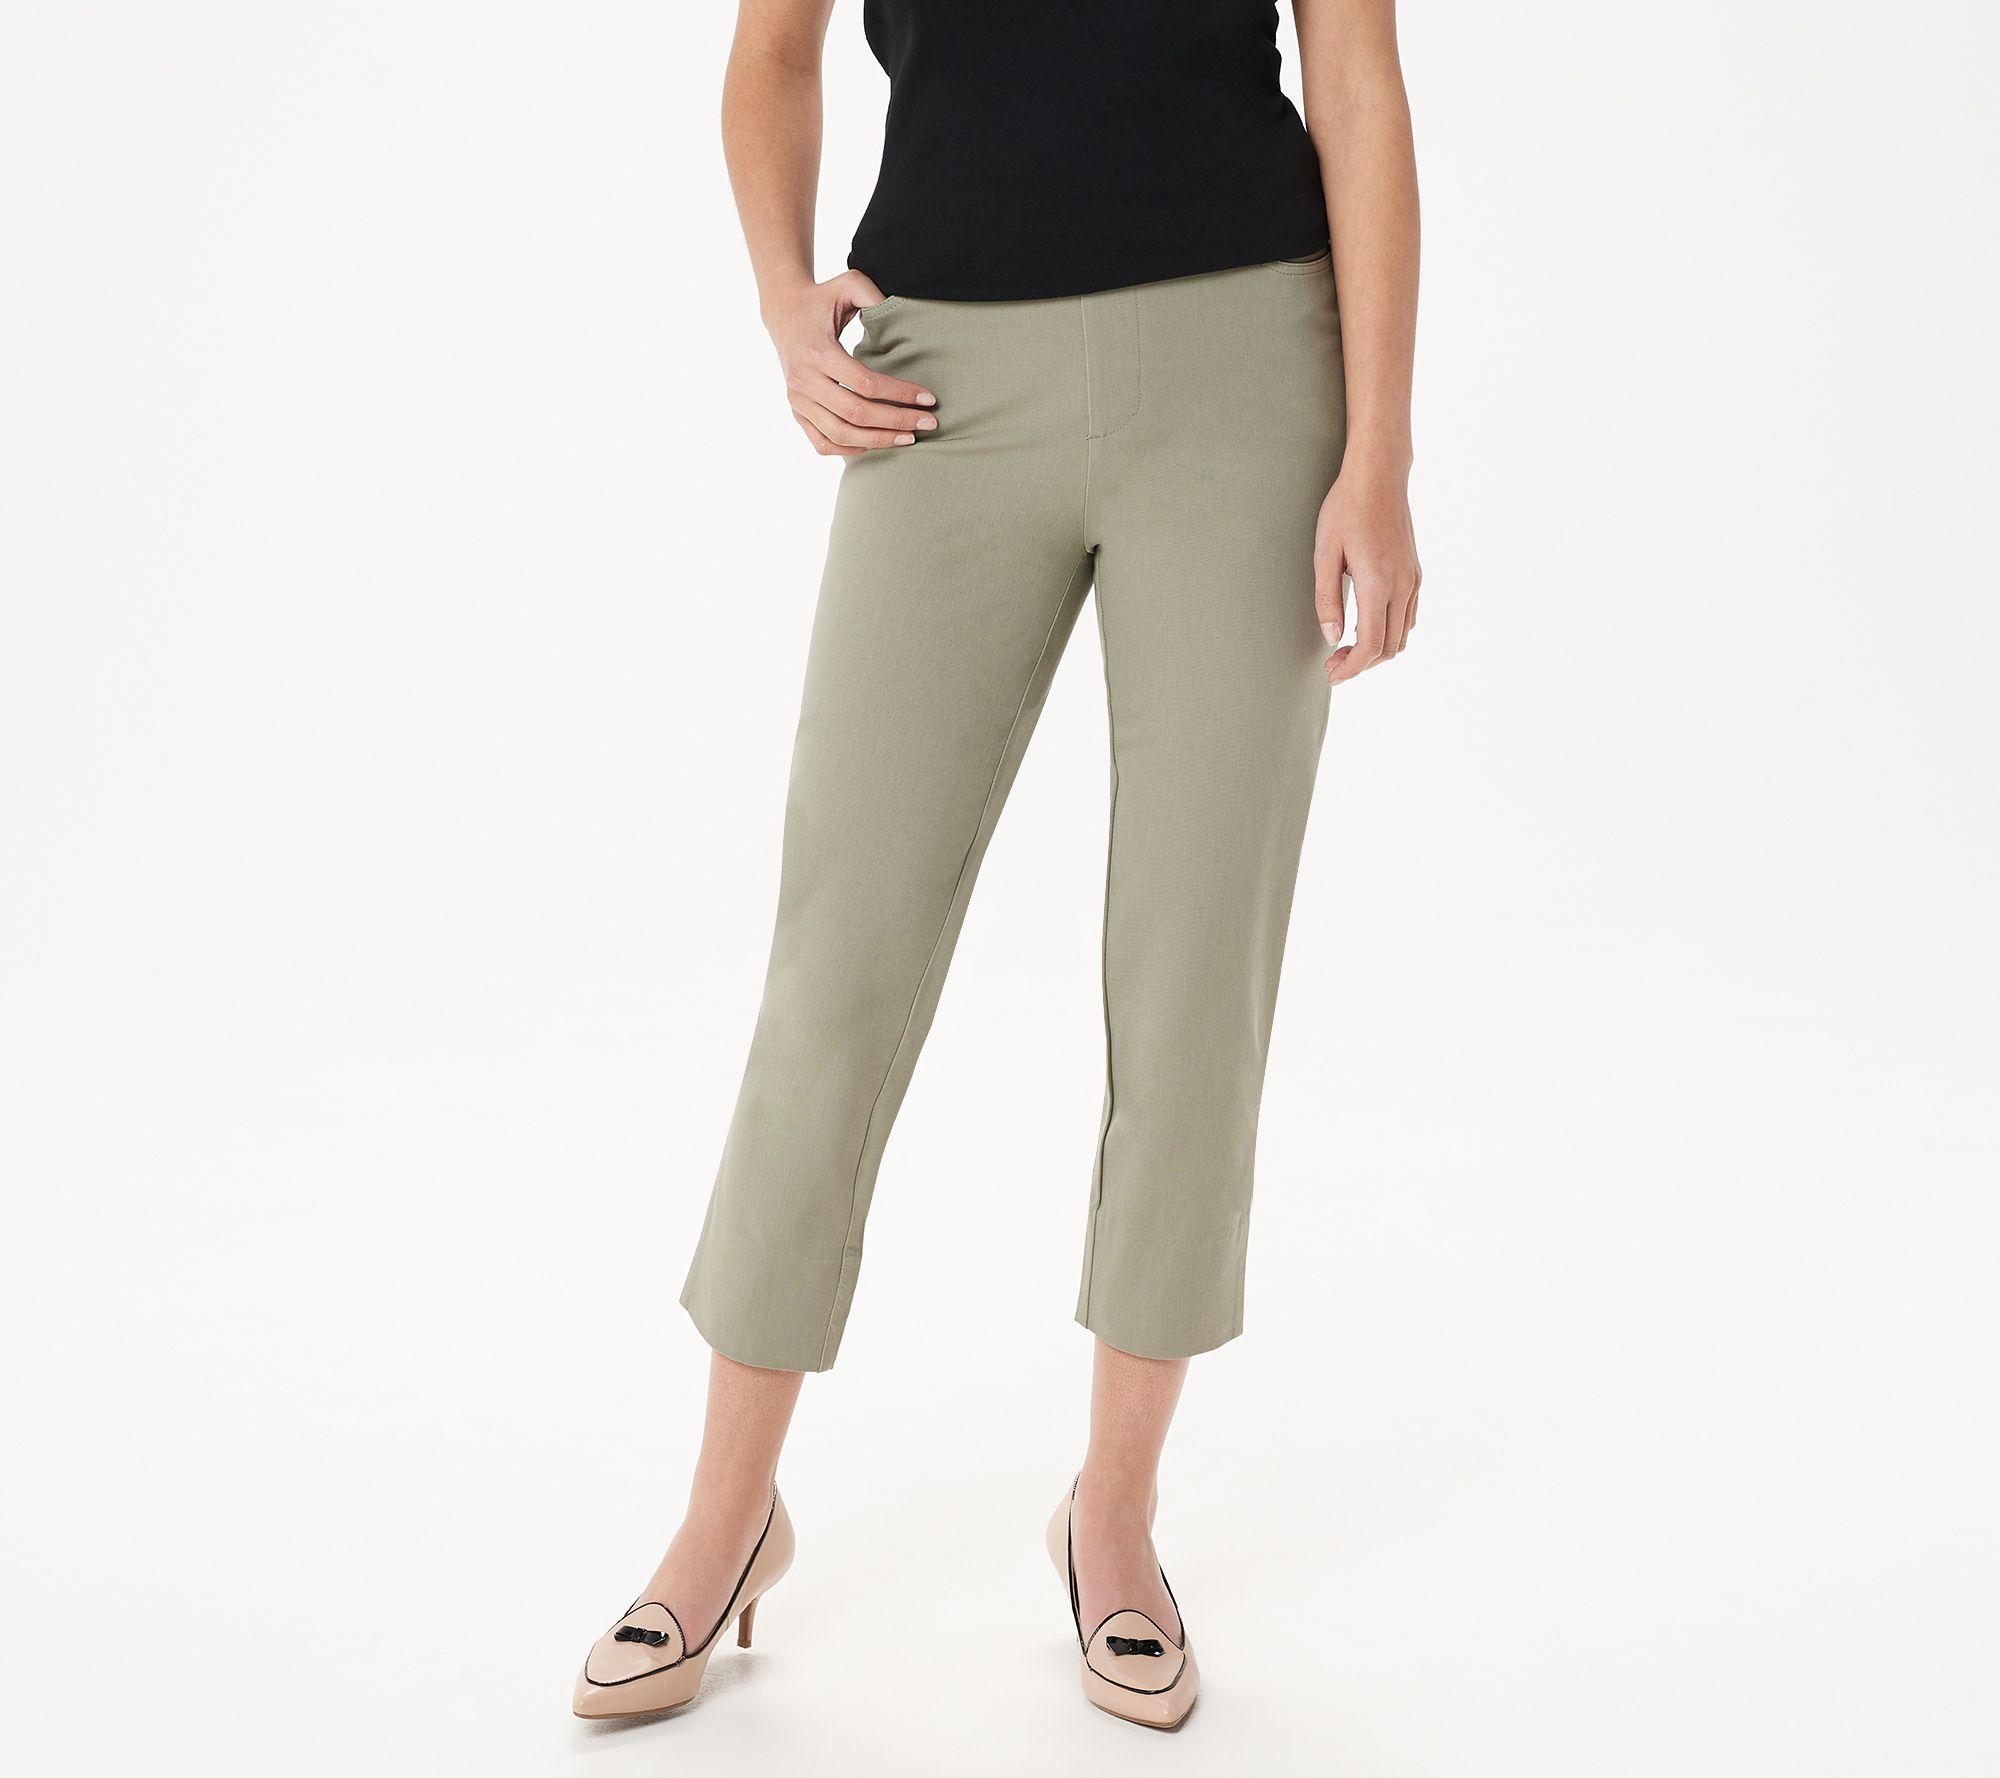 367d75bdf Isaac Mizrahi Live! Regular 24/7 Stretch Crop Pants with Back Slit ...